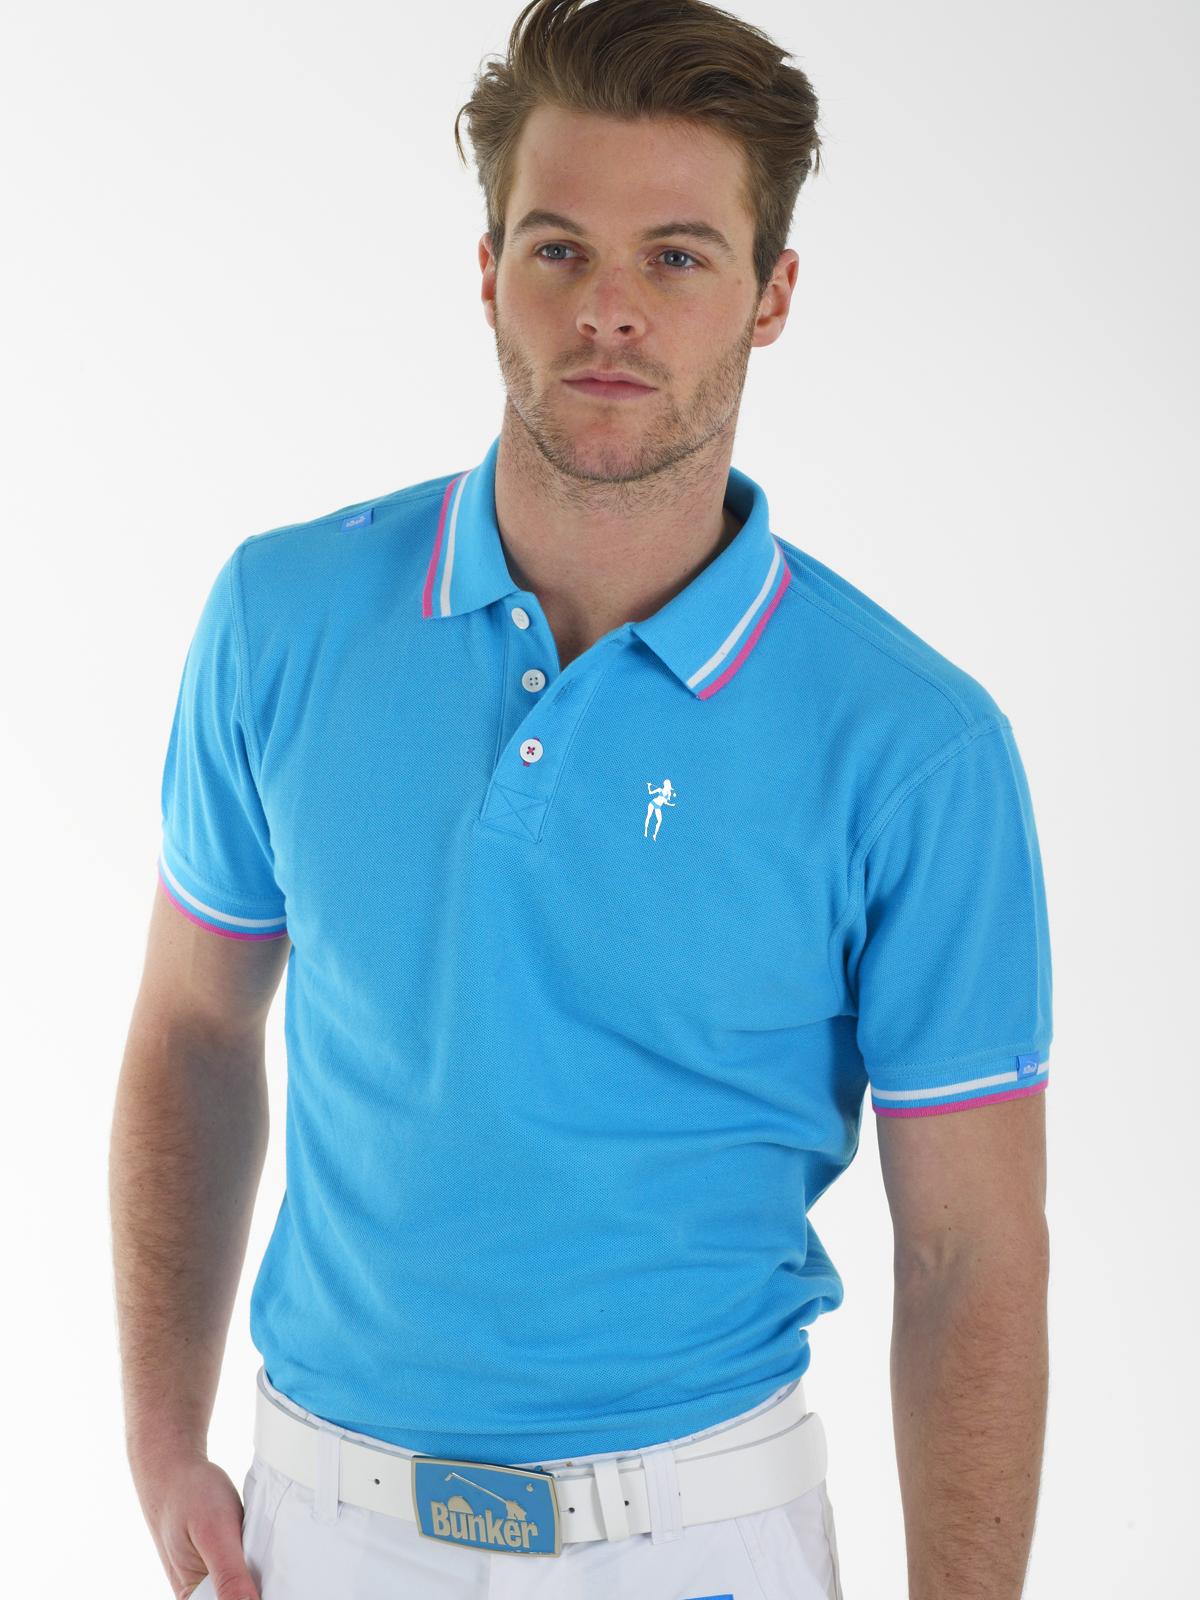 25+ Bunker mentality golf clothing ideas